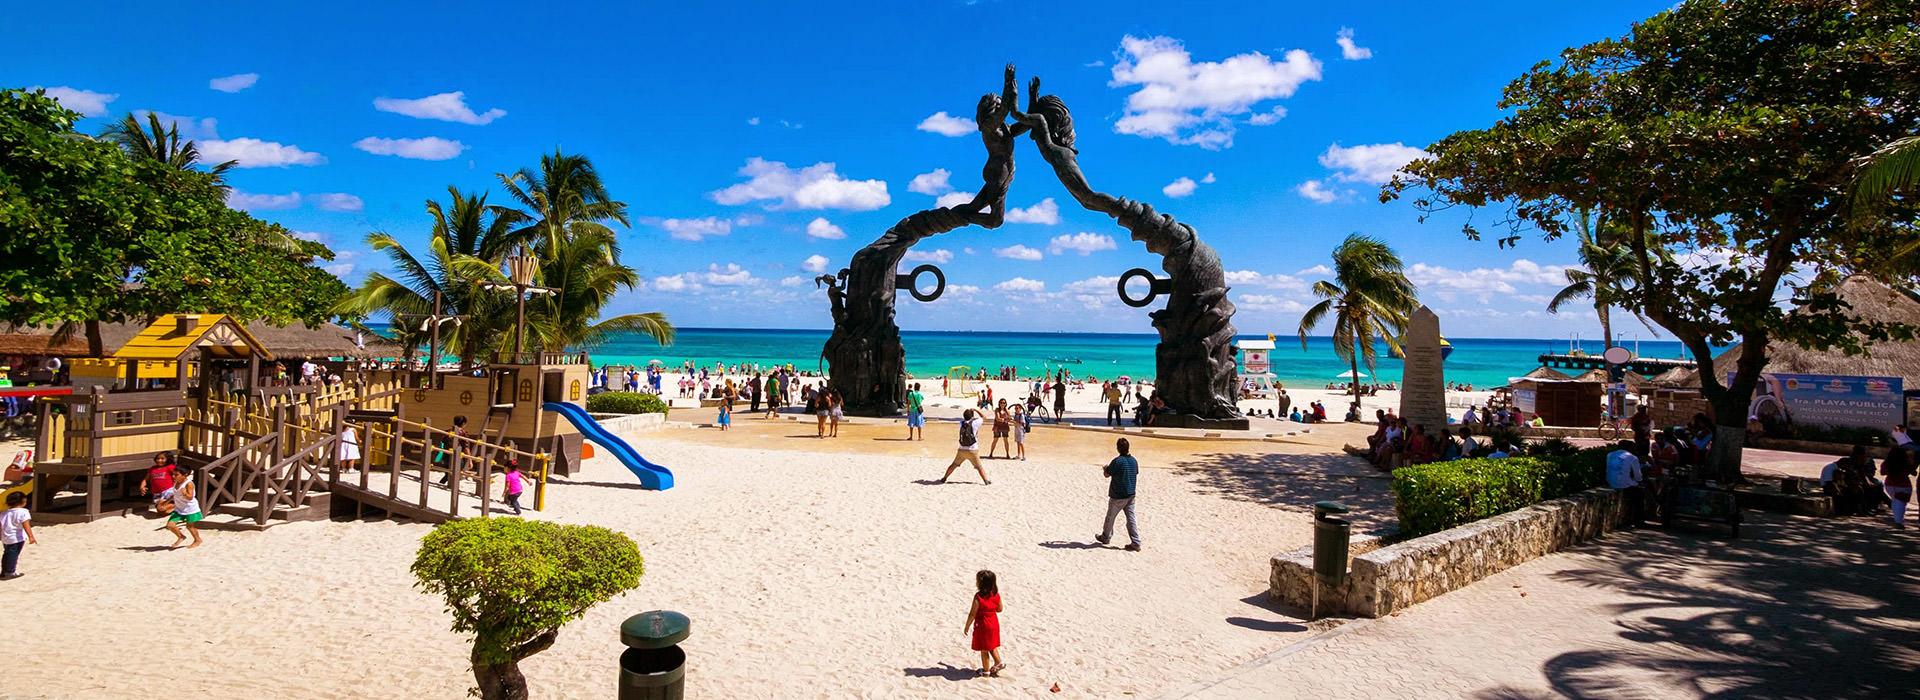 Main photo of playa-del-carmen